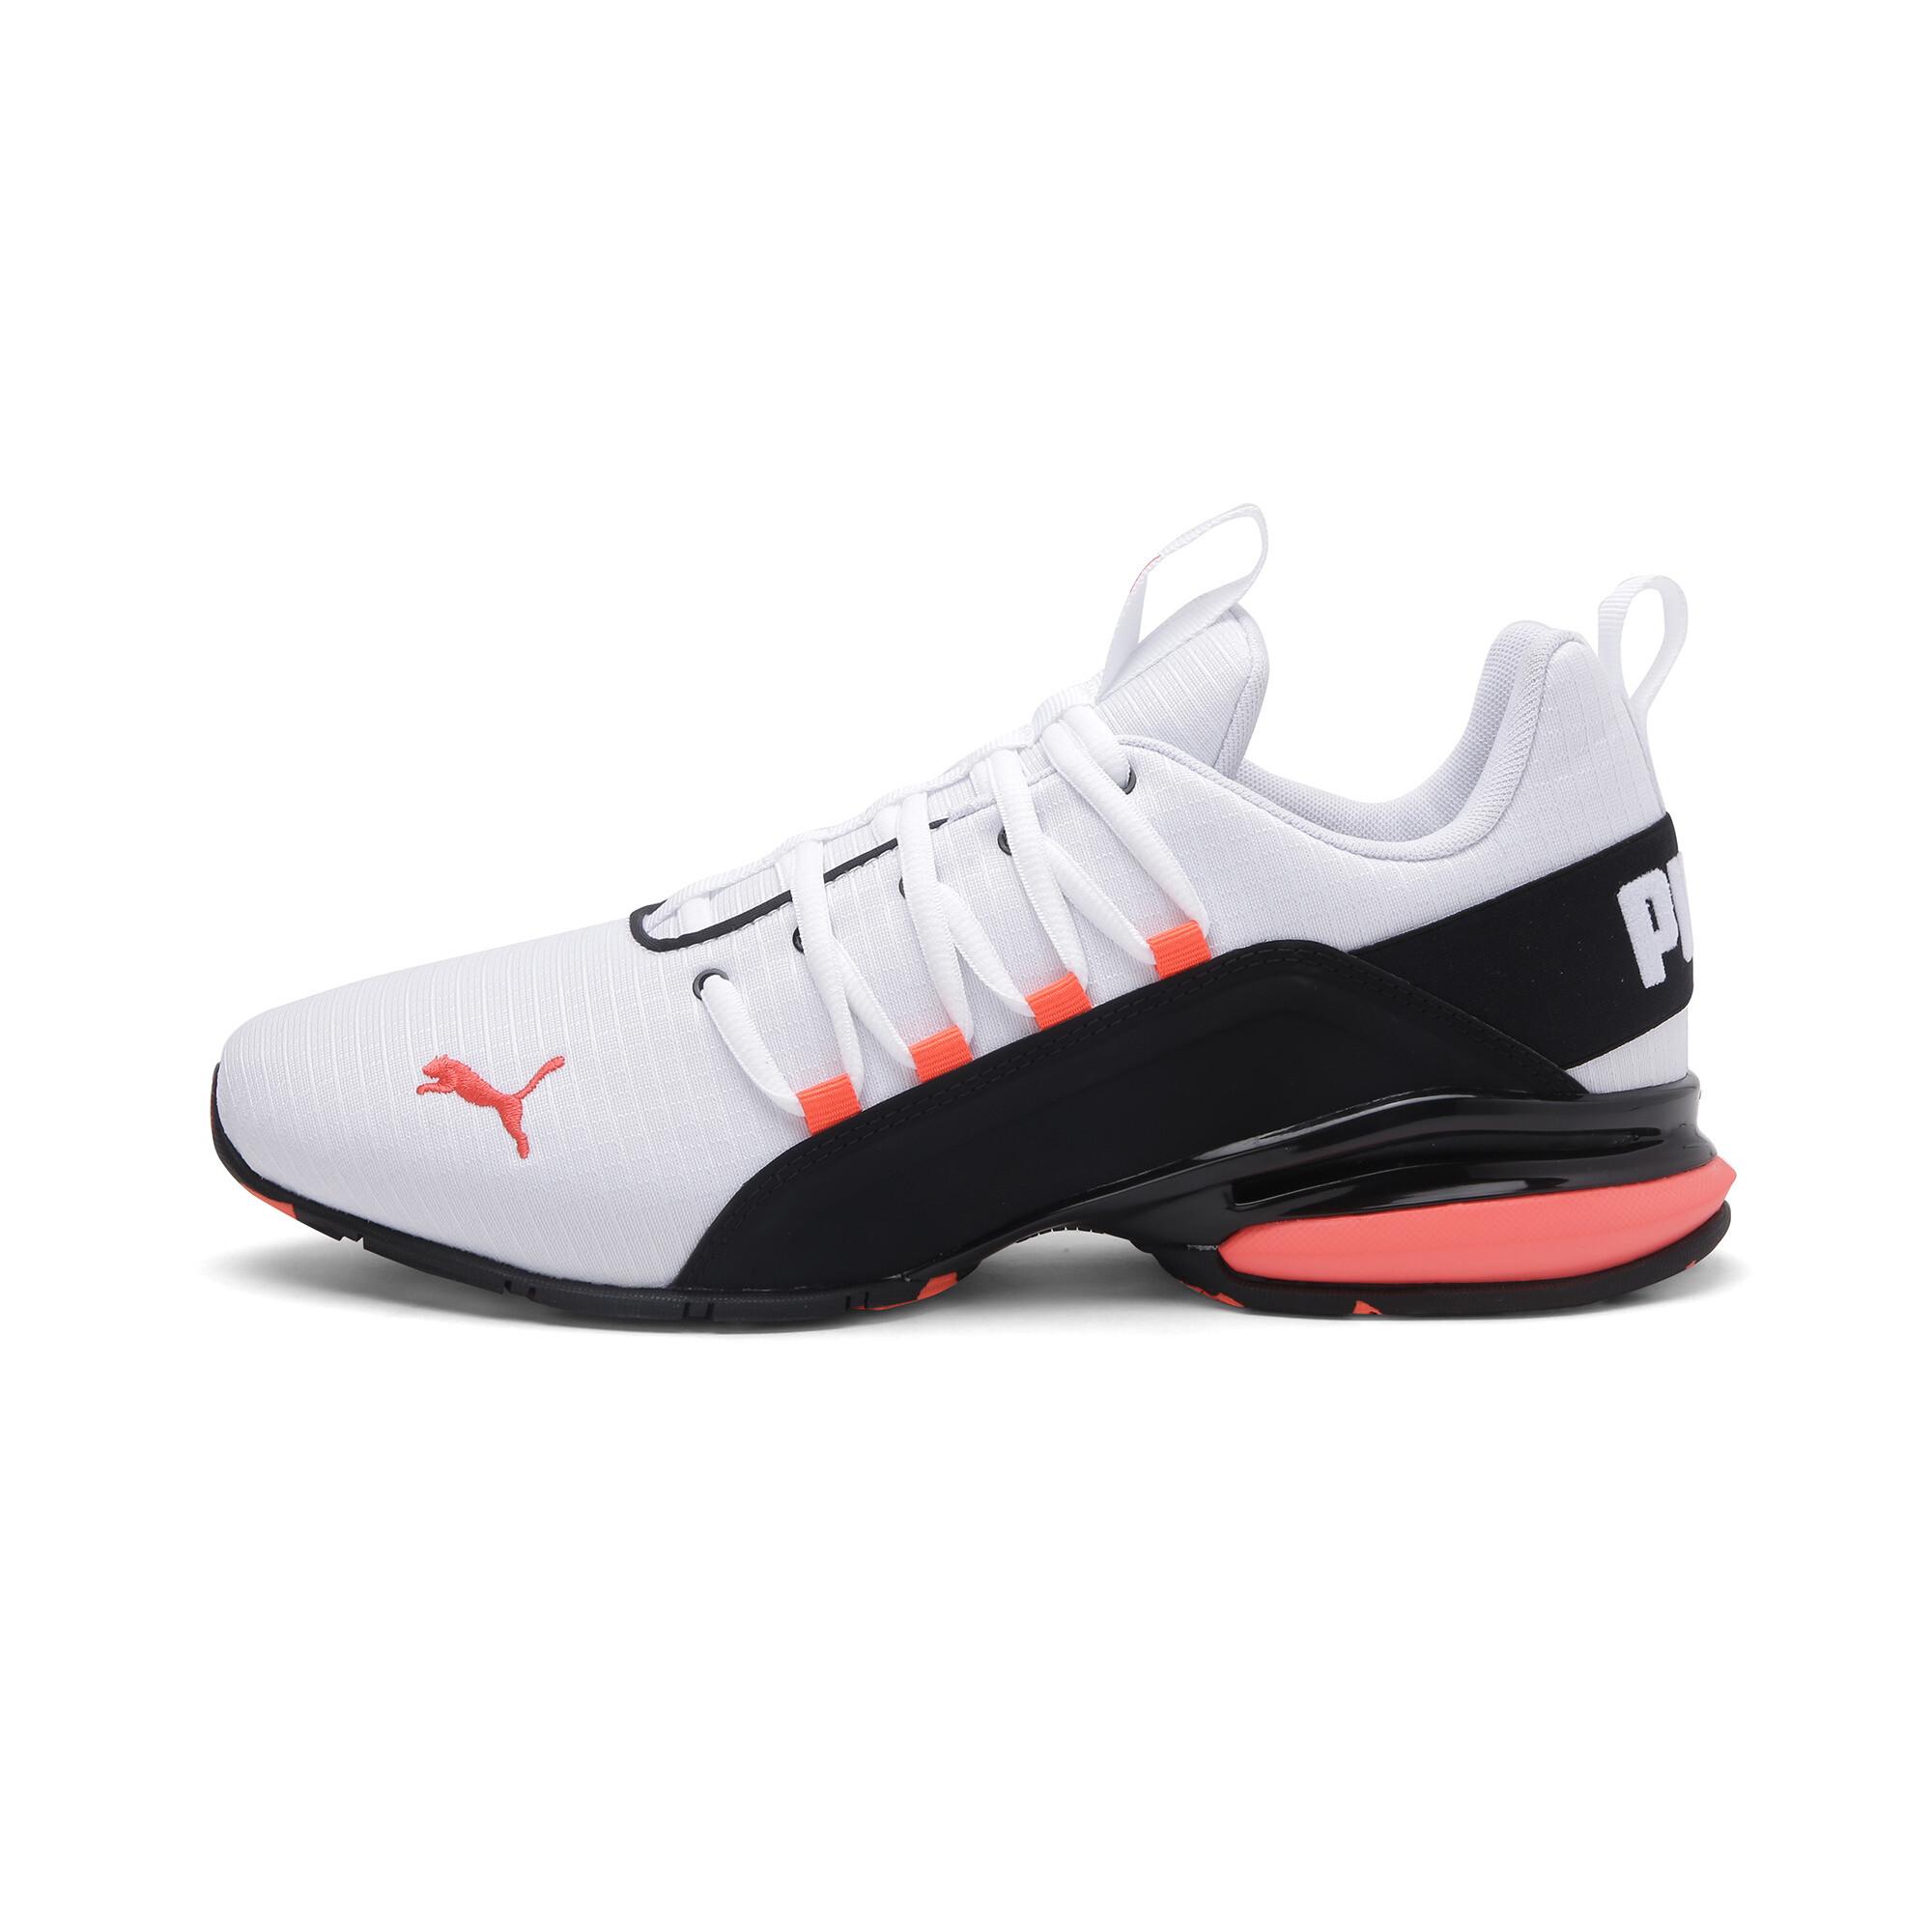 PUMA-Men-039-s-Axelion-Rip-Training-Shoes thumbnail 4